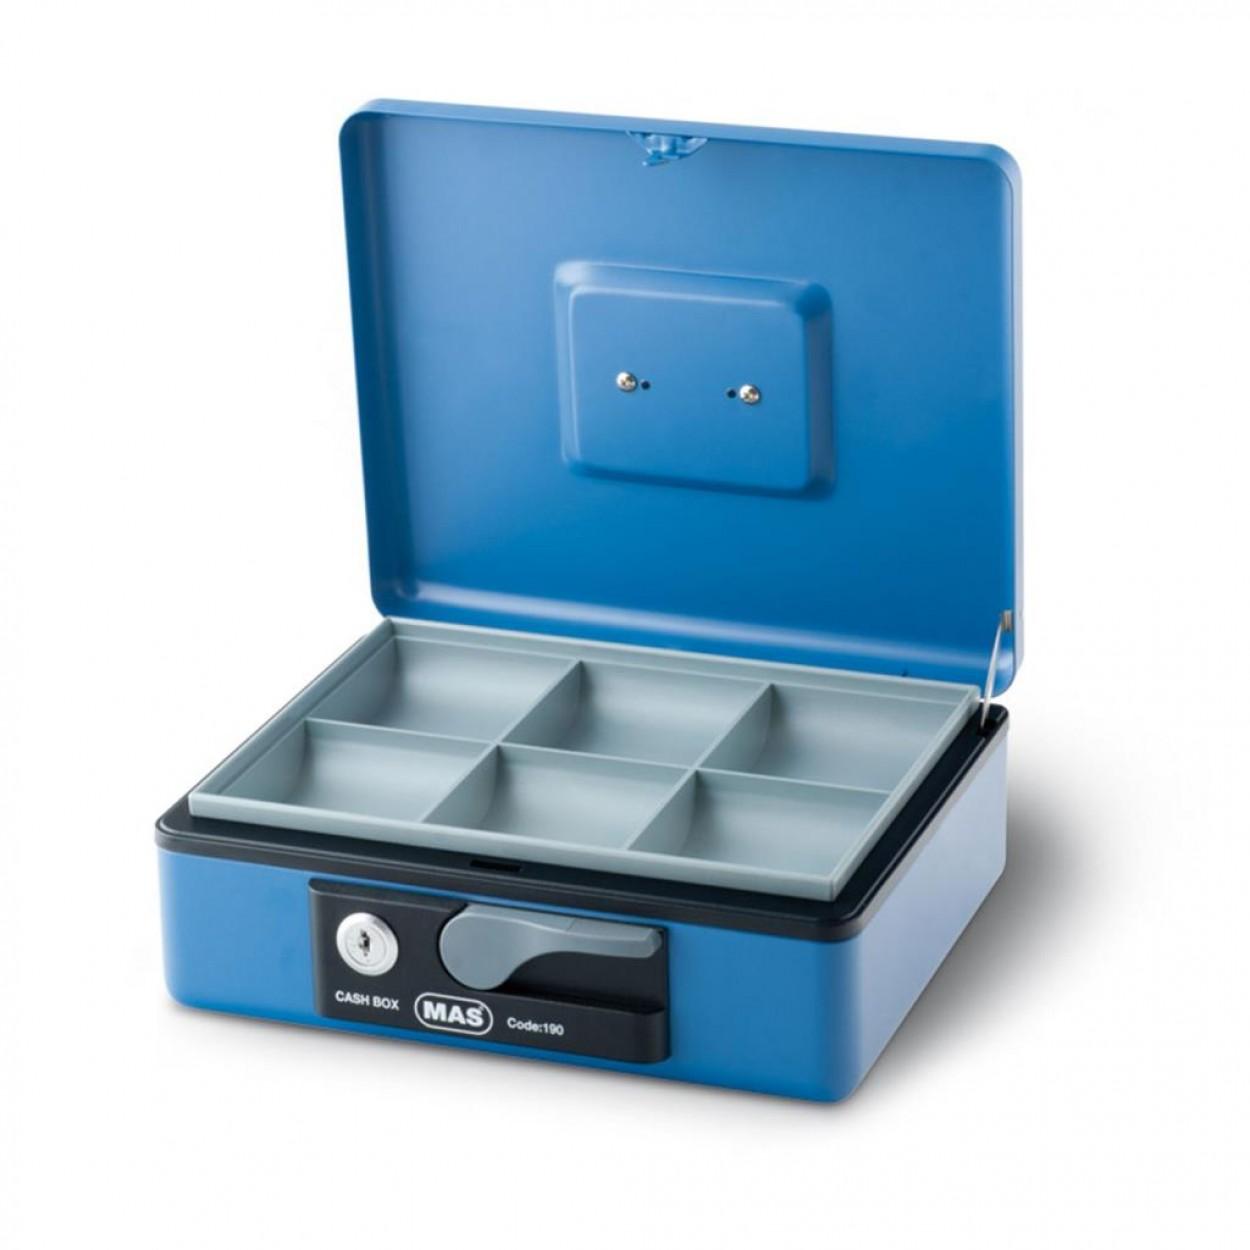 Mas 190 Büyük Boy Metal Para Kasası Mavi